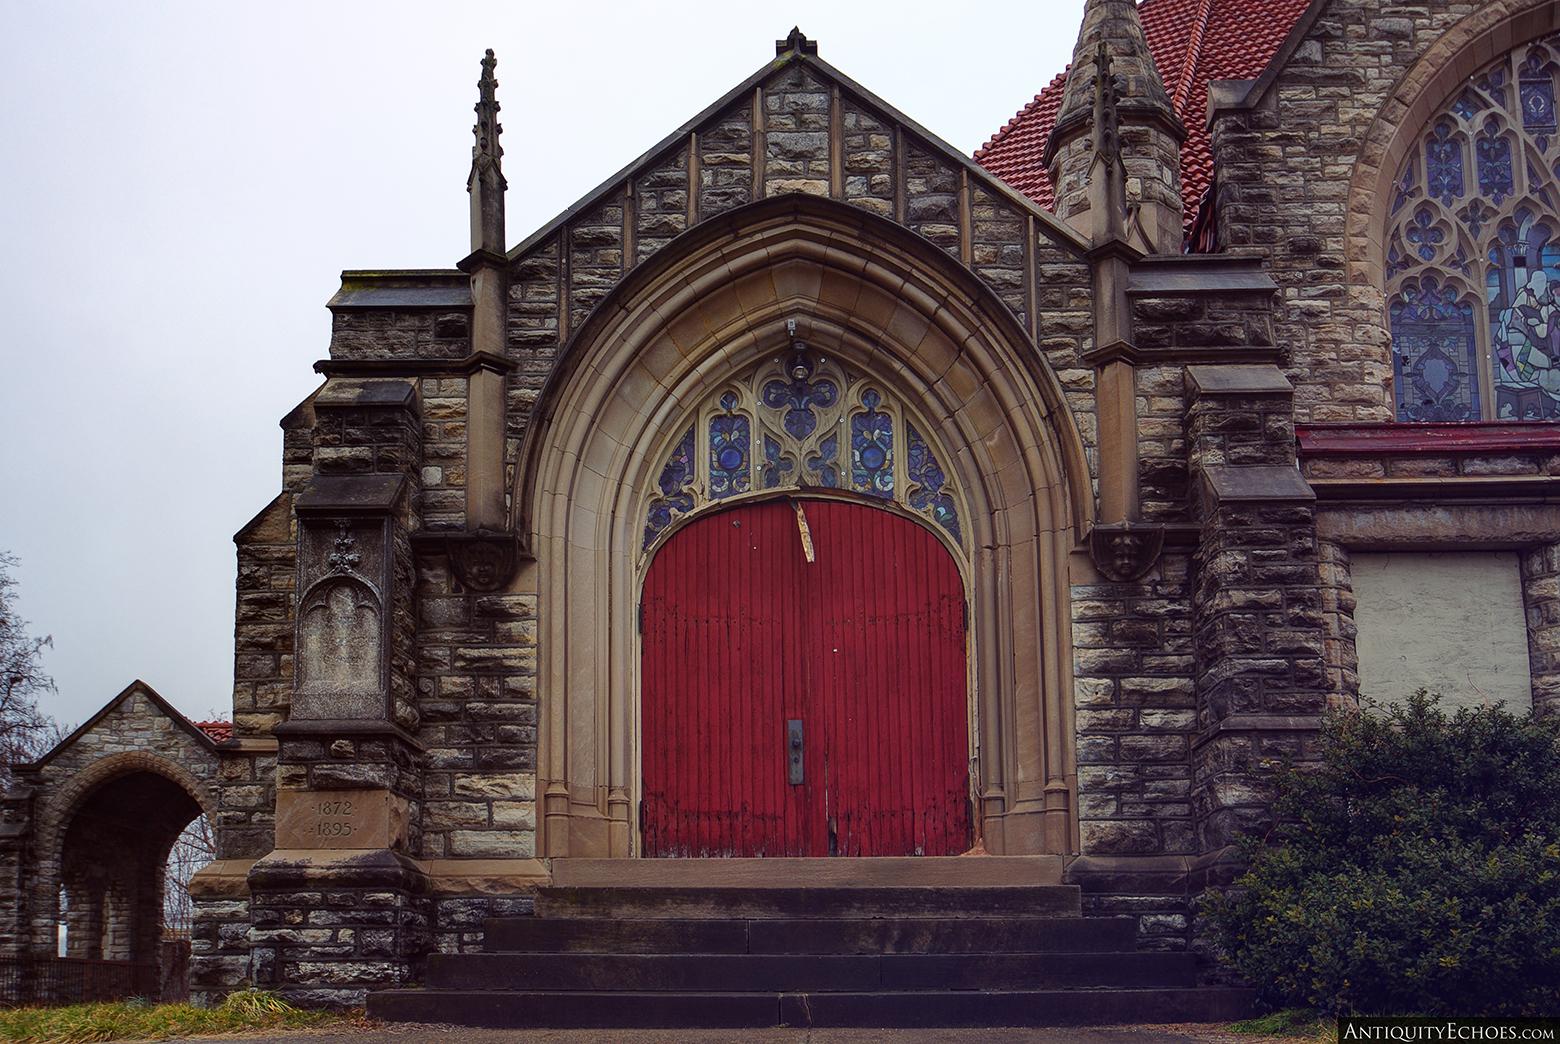 Third Presbyterian - Arched Wooden Door